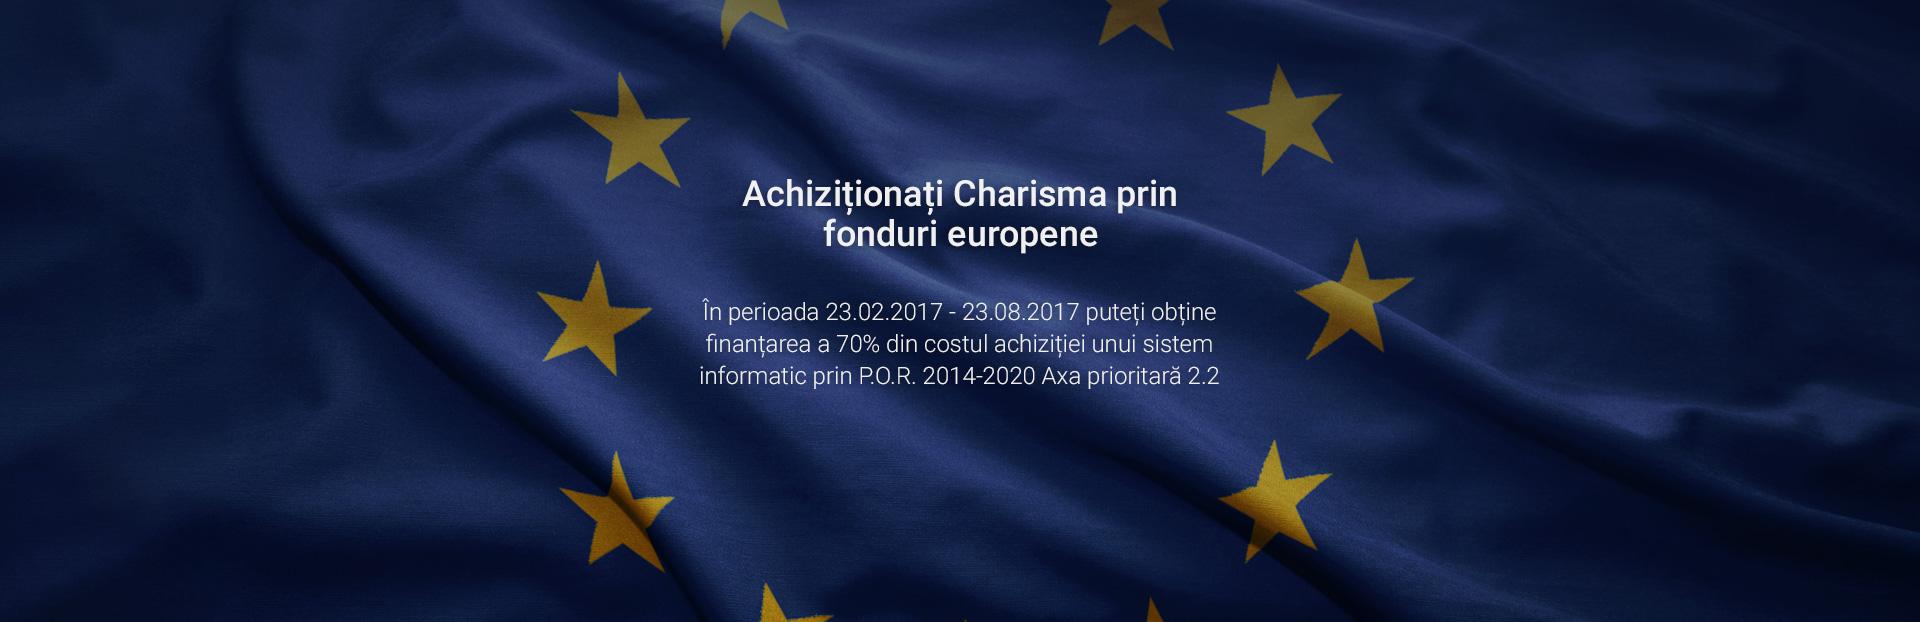 Charisma prin fonduri europene